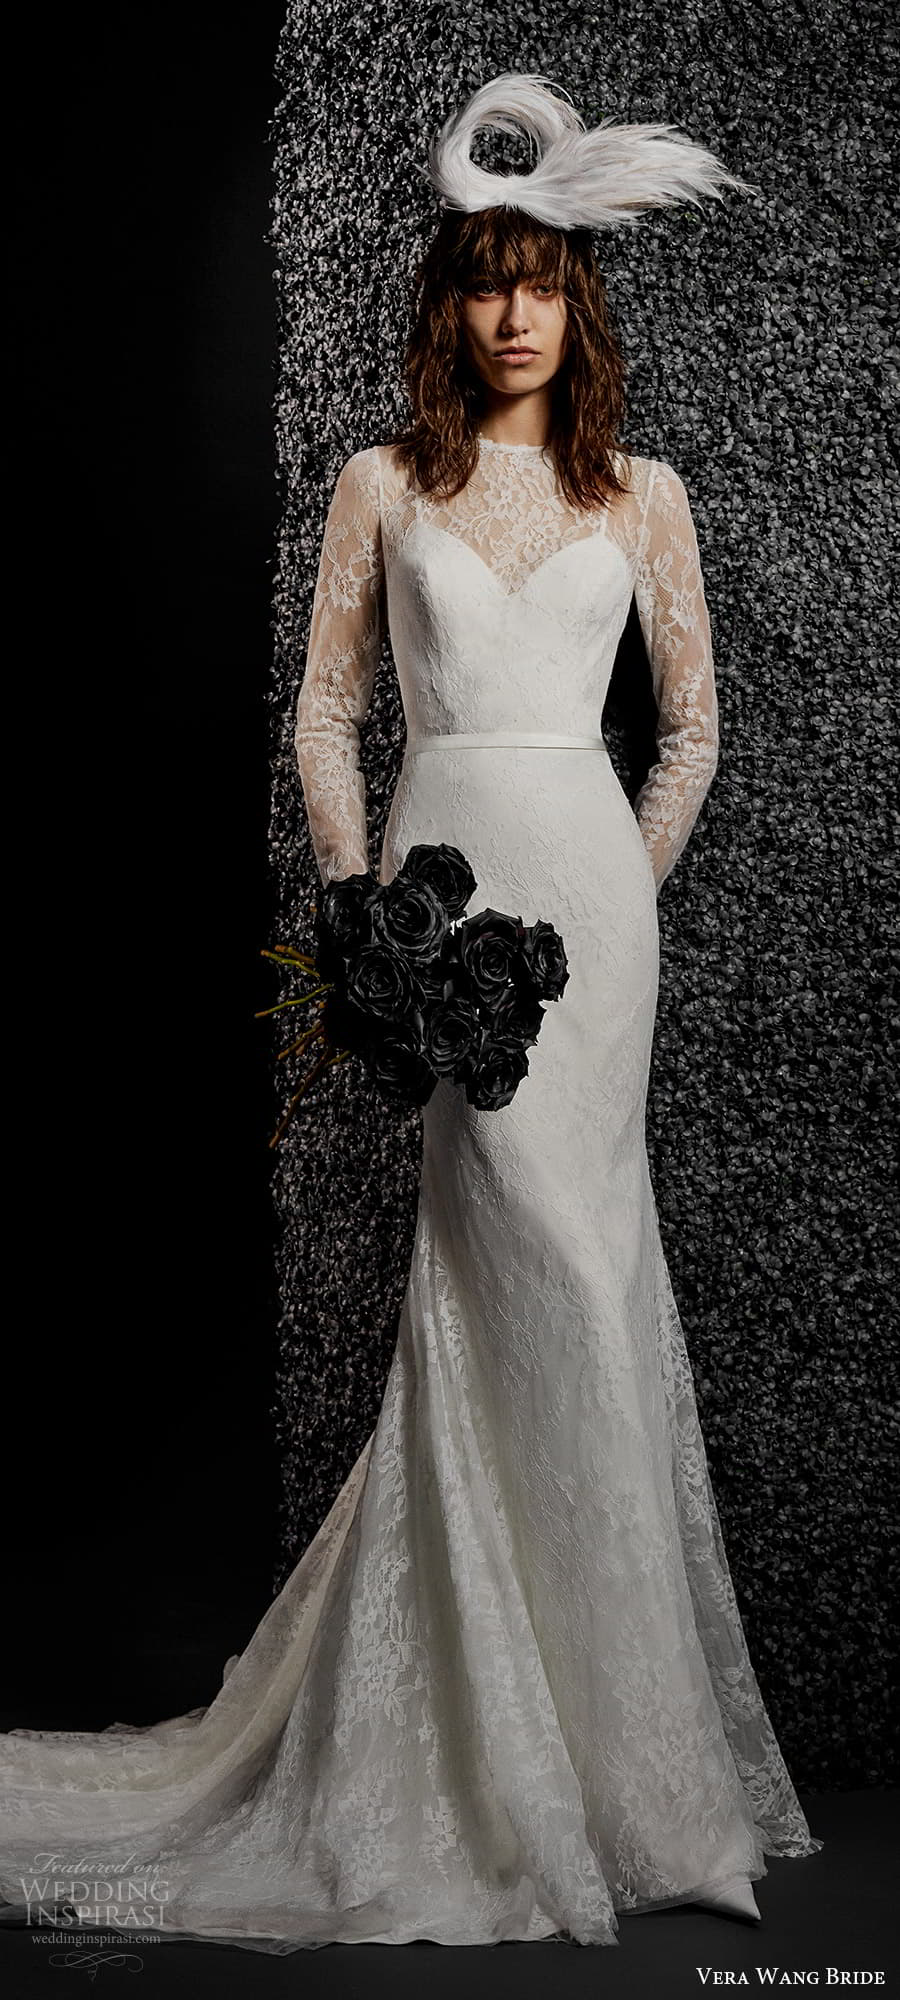 vera wang bride pronovias fall 2021 bridal sheer long sleeve illusion jewel neckline embellished lace sheath wedding dress chapel train (35) mv